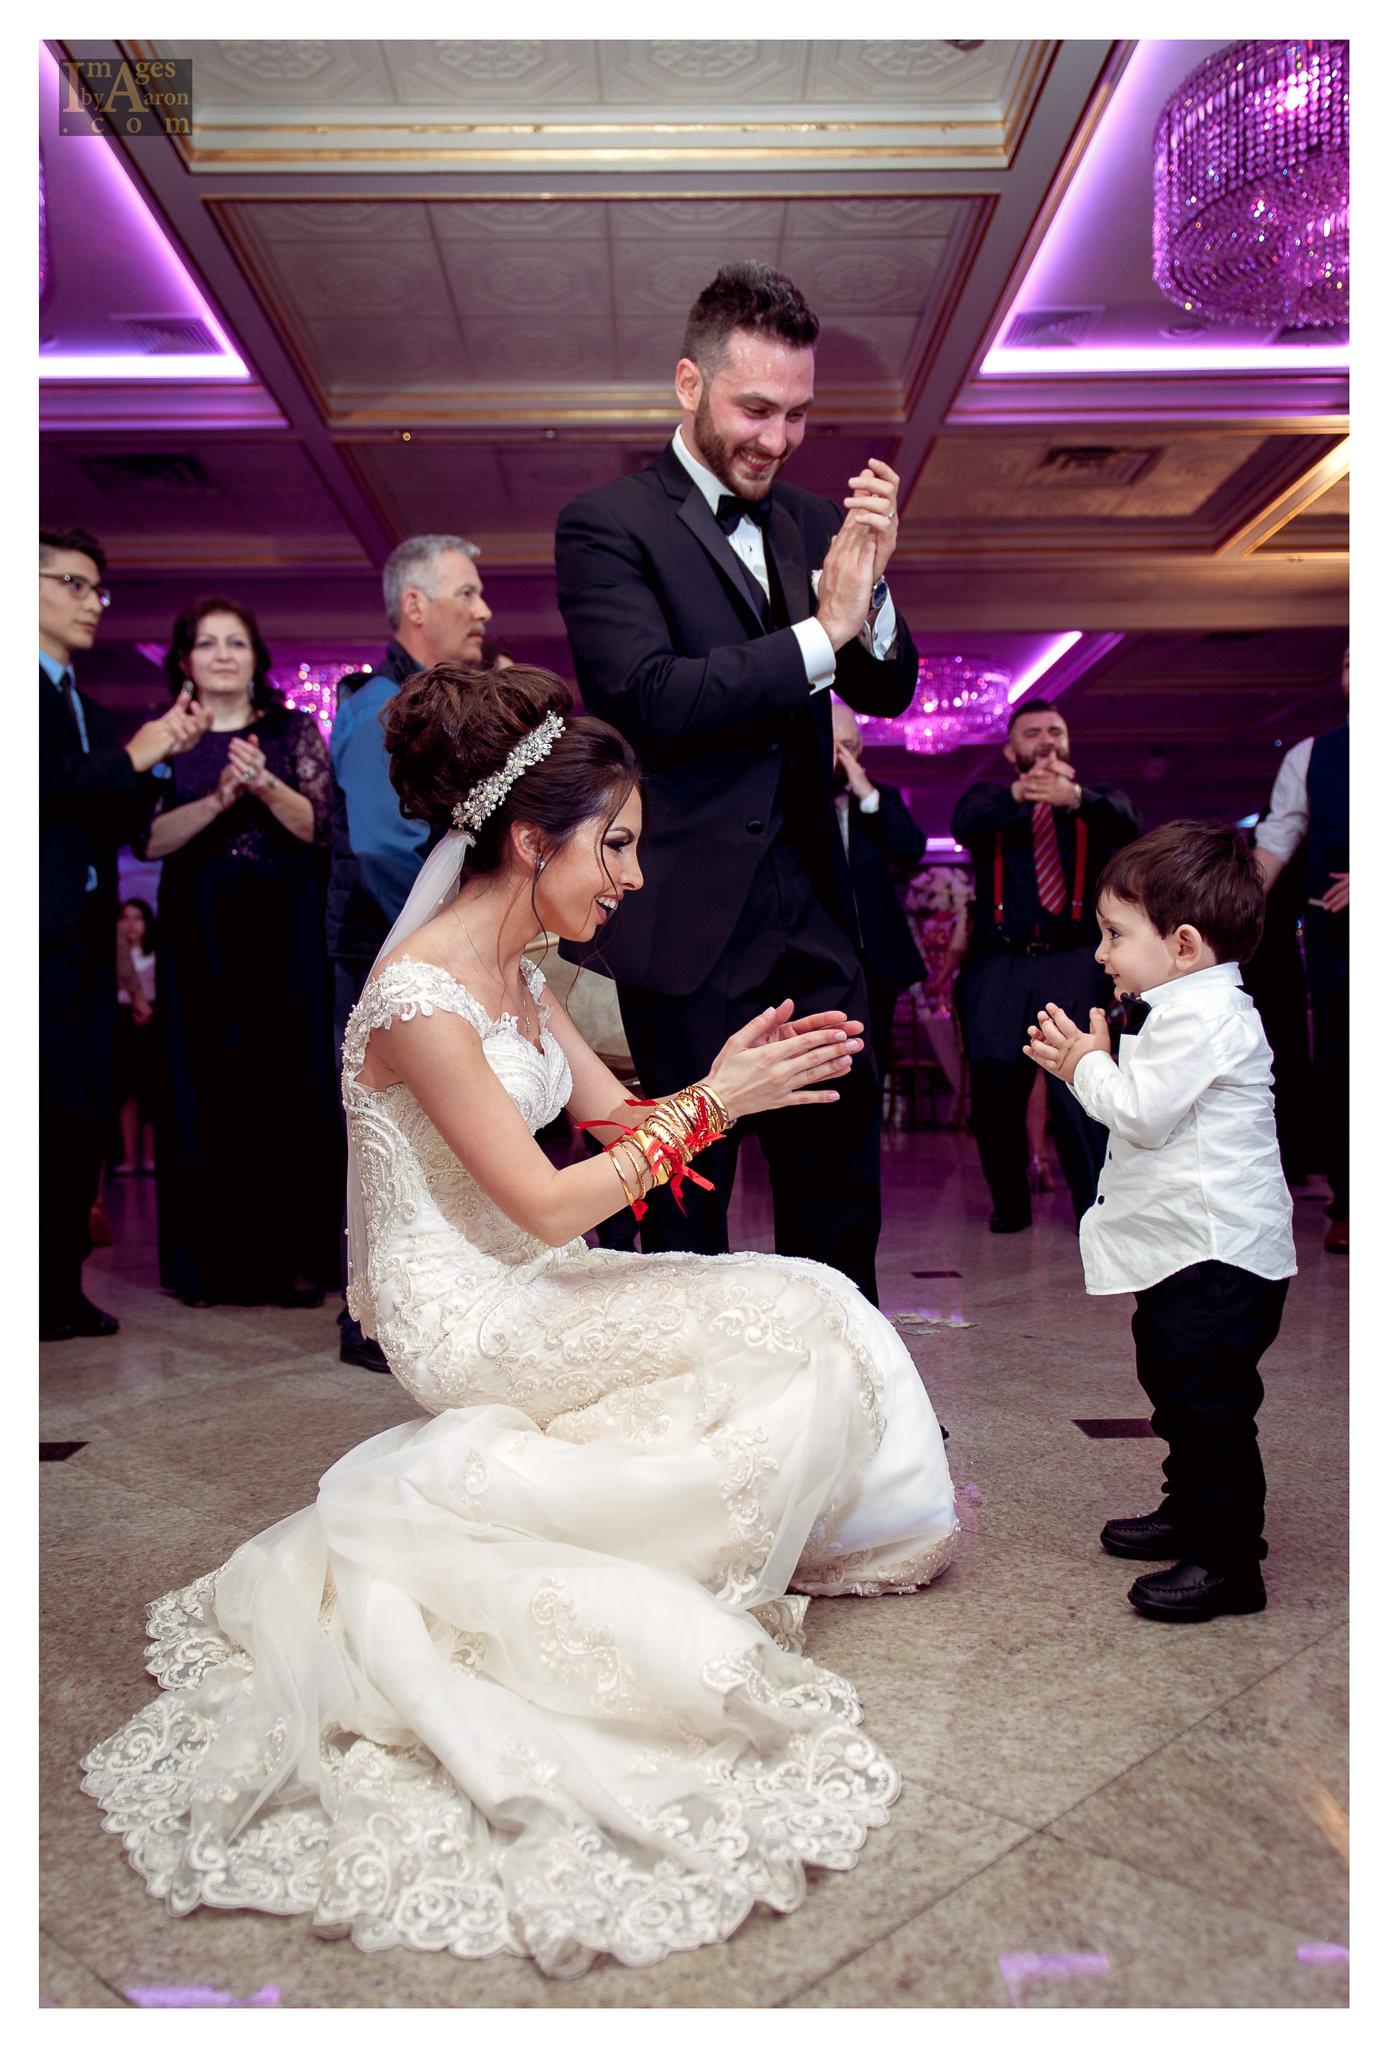 Gokce Turkish Wedding Reception New York Photographer Wedding Photography The Royal Manor-40.jpg